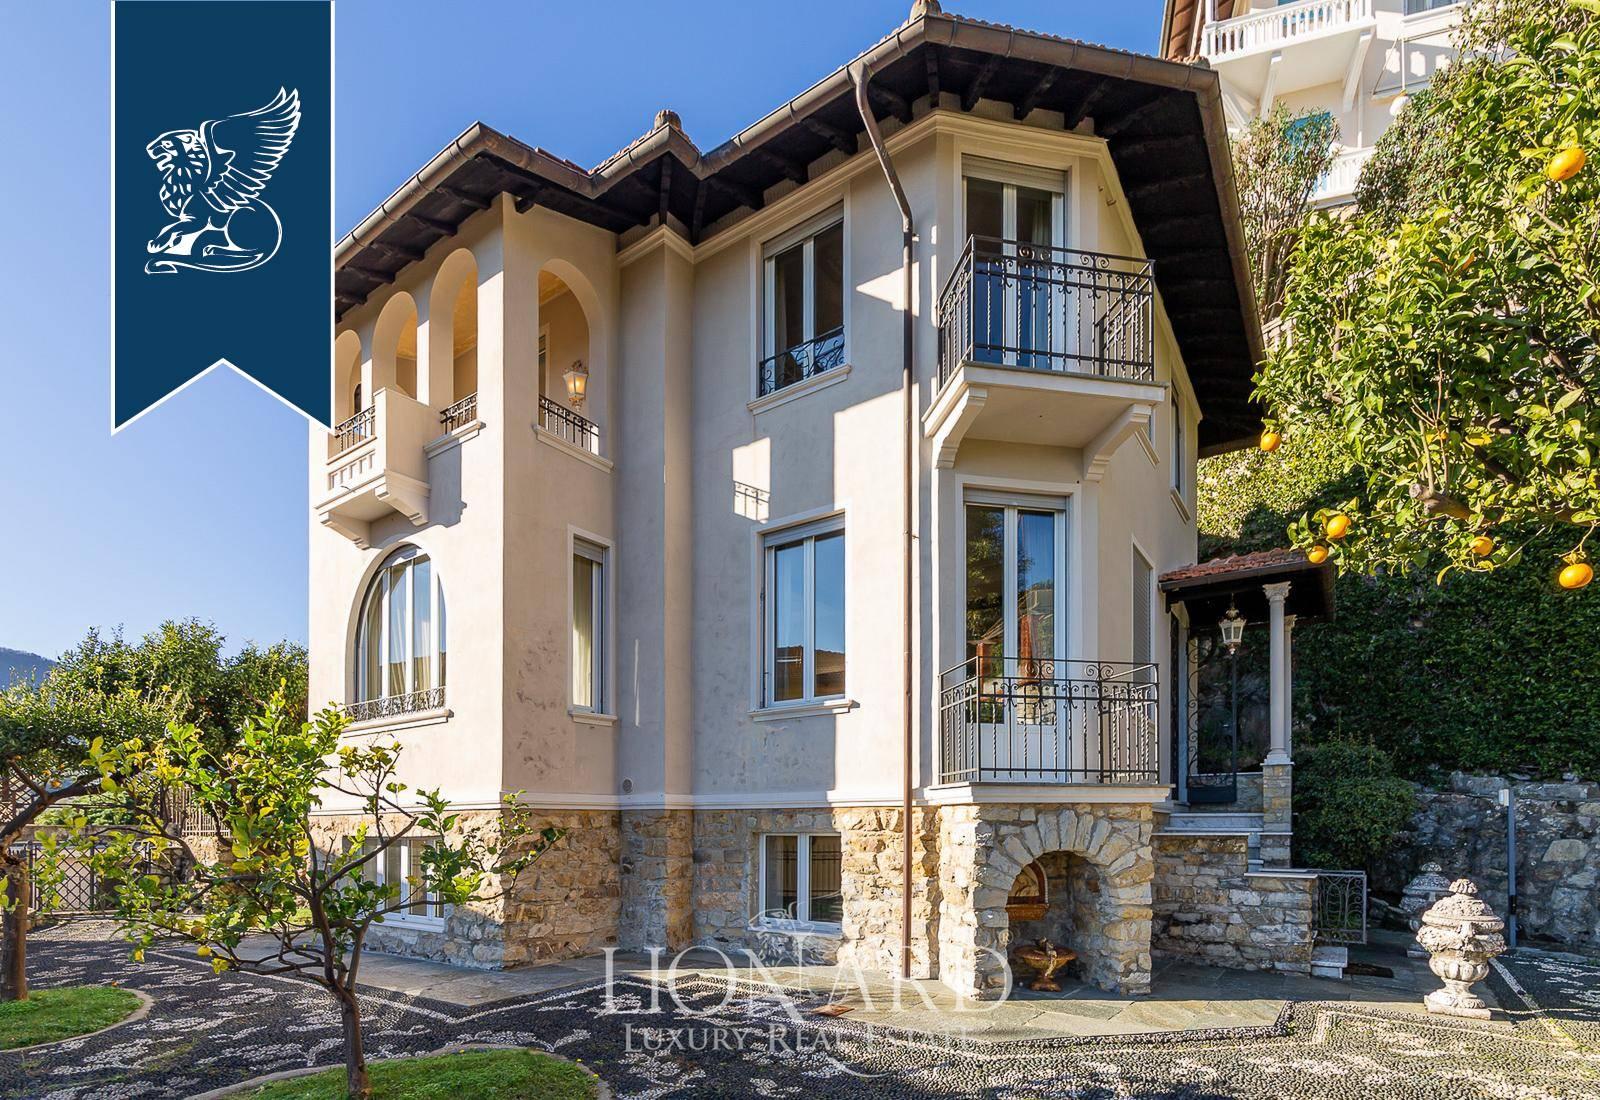 Villa in Vendita a Santa Margherita Ligure: 0 locali, 350 mq - Foto 3